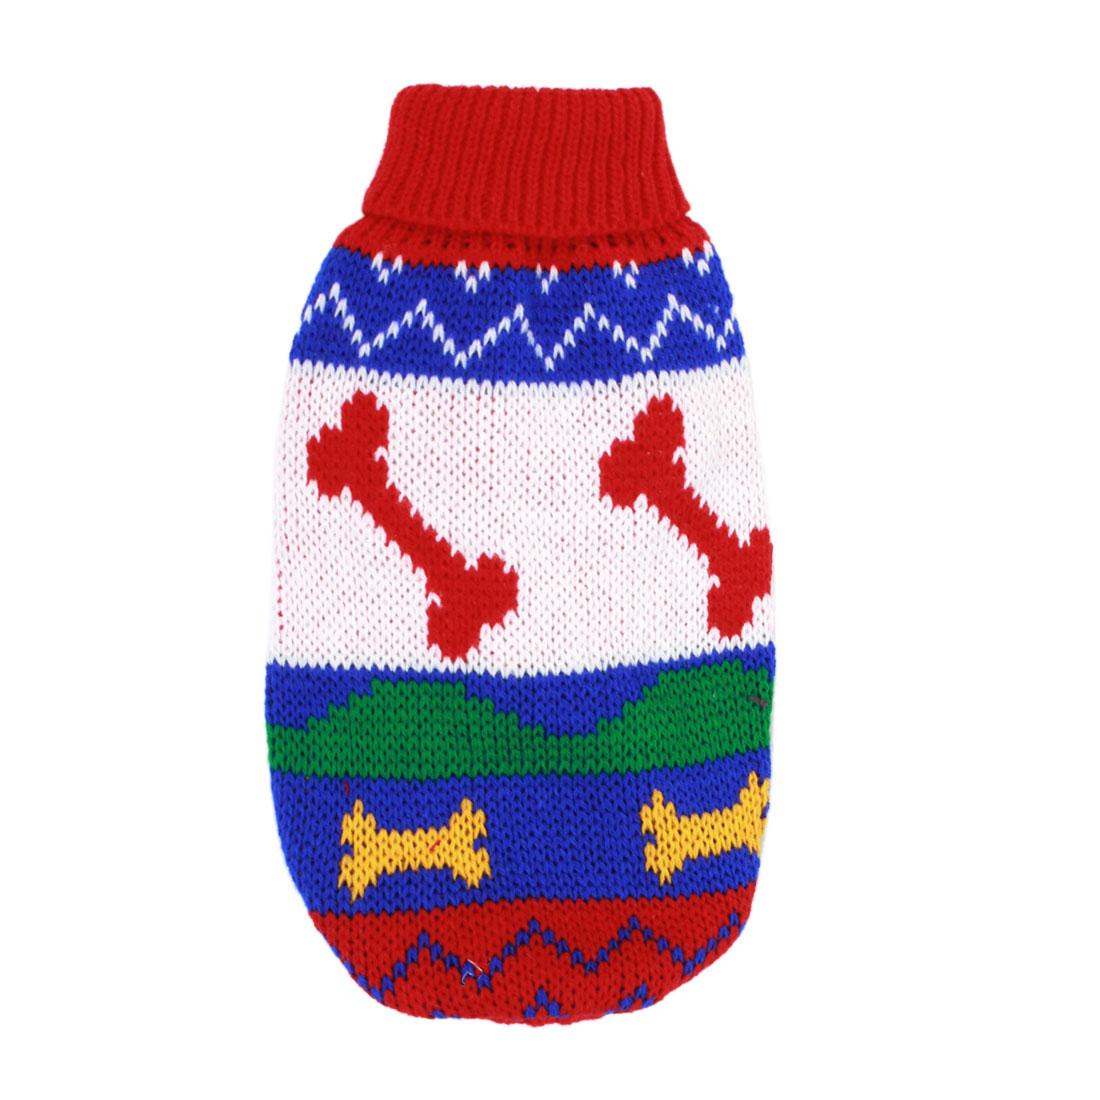 Pet Dog Puppy Bone Pattern Ribbed Cuff Knitwear Turtleneck Apparel Coat Sweater Assorted Color Size XXS